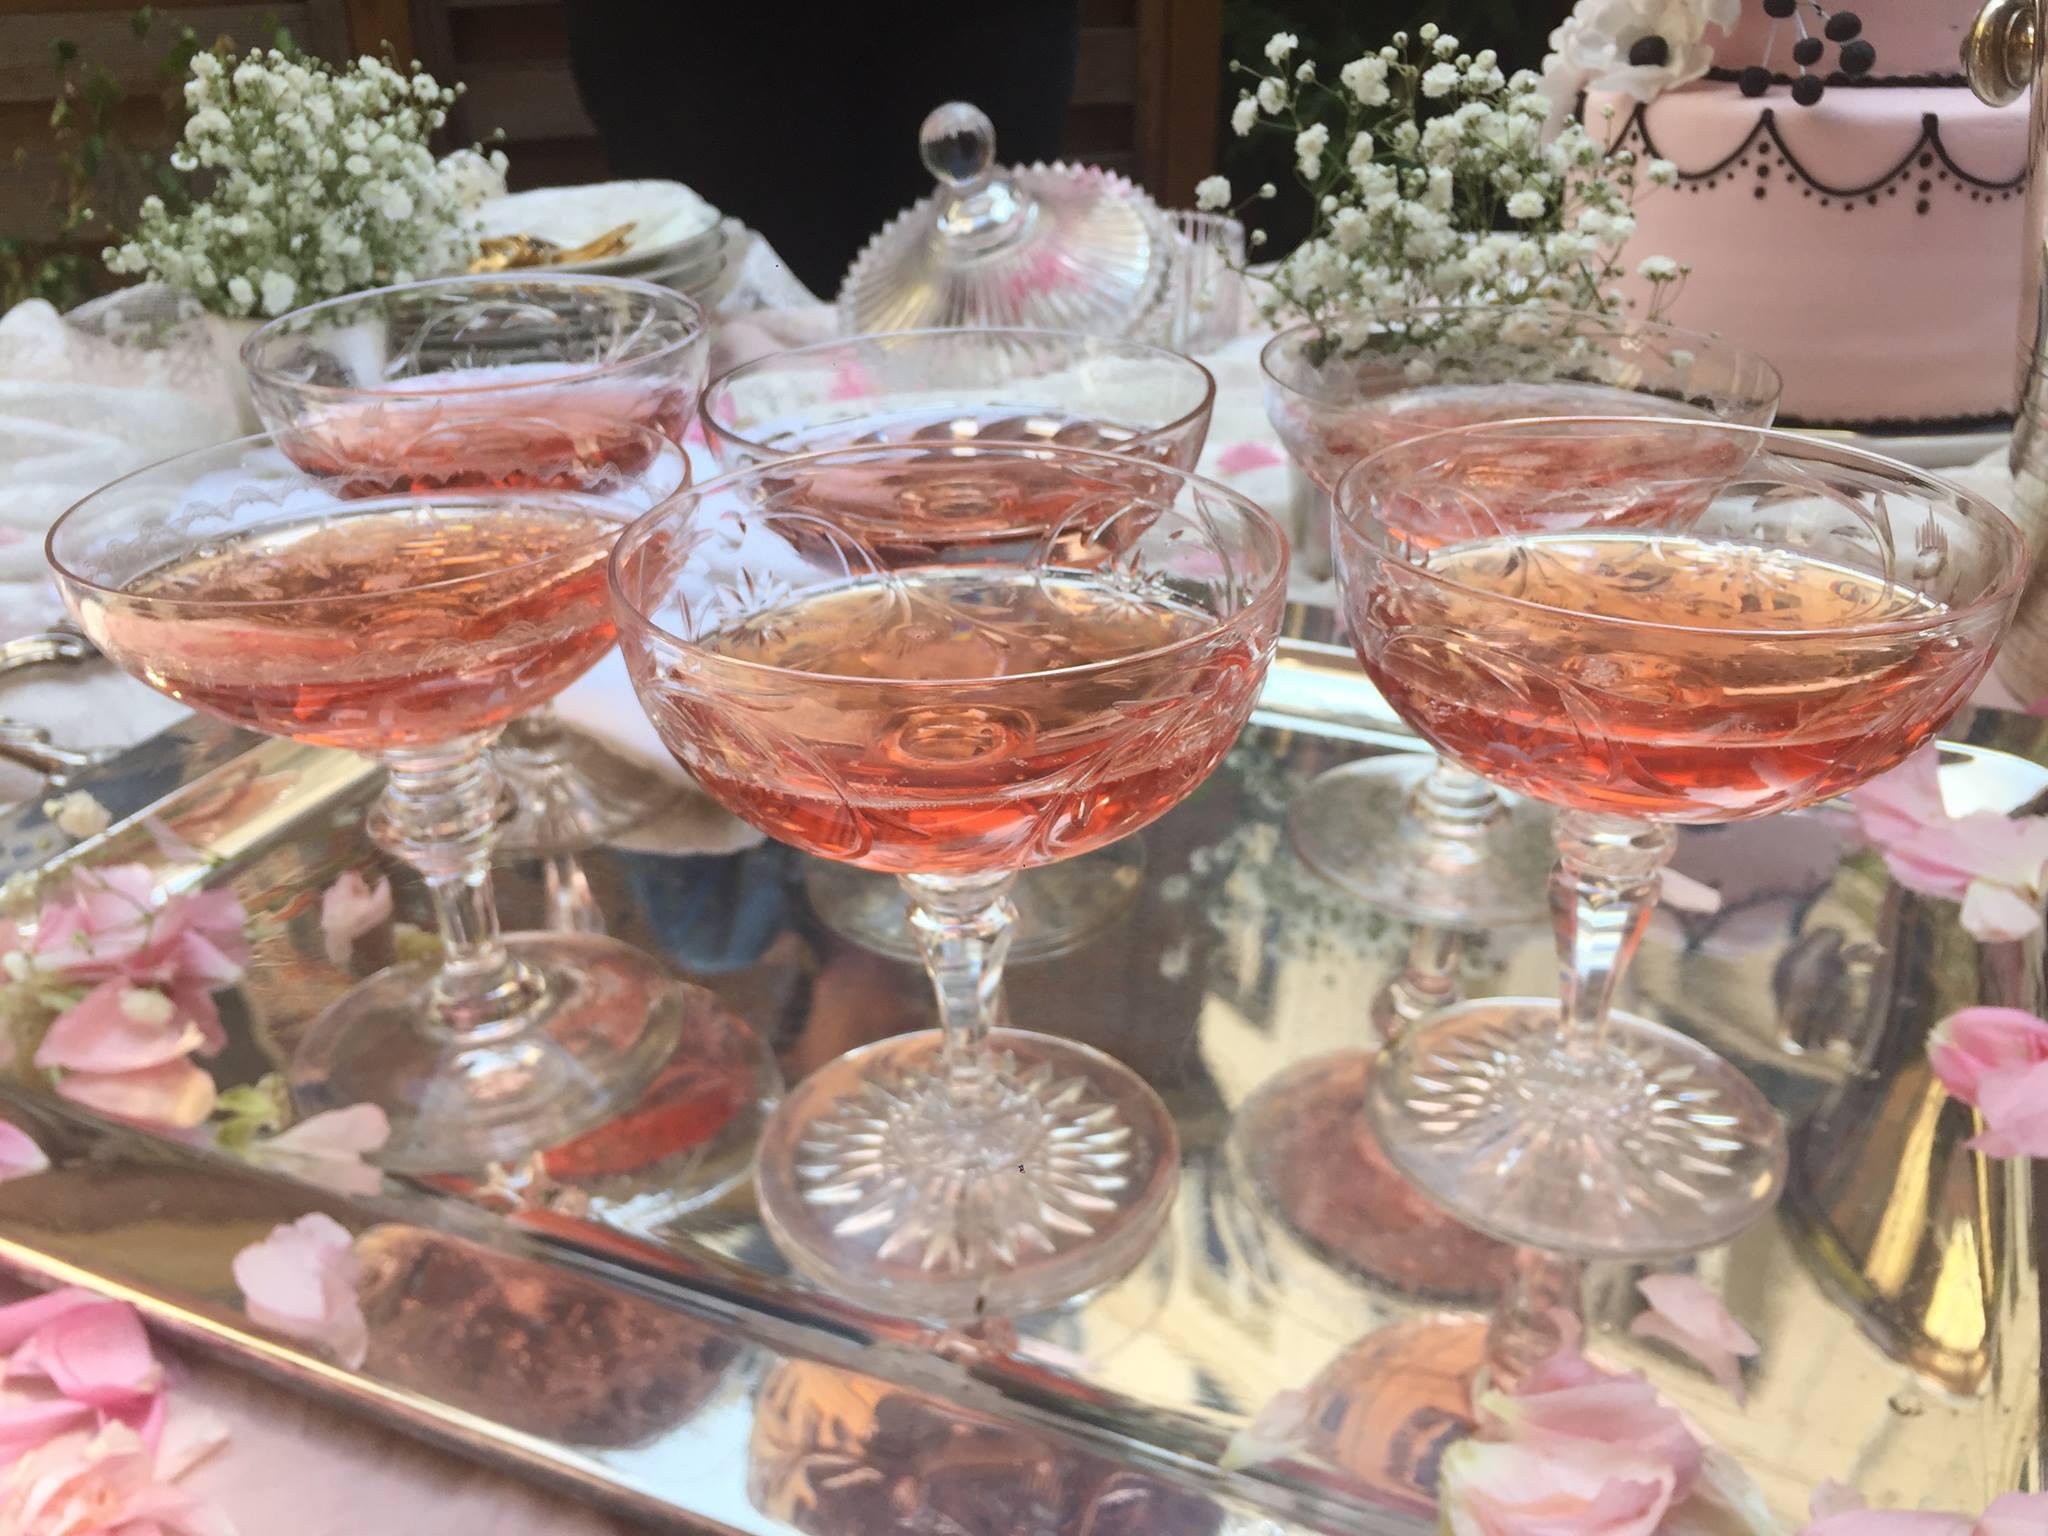 52 Martinis Paris Food & Drink Events December